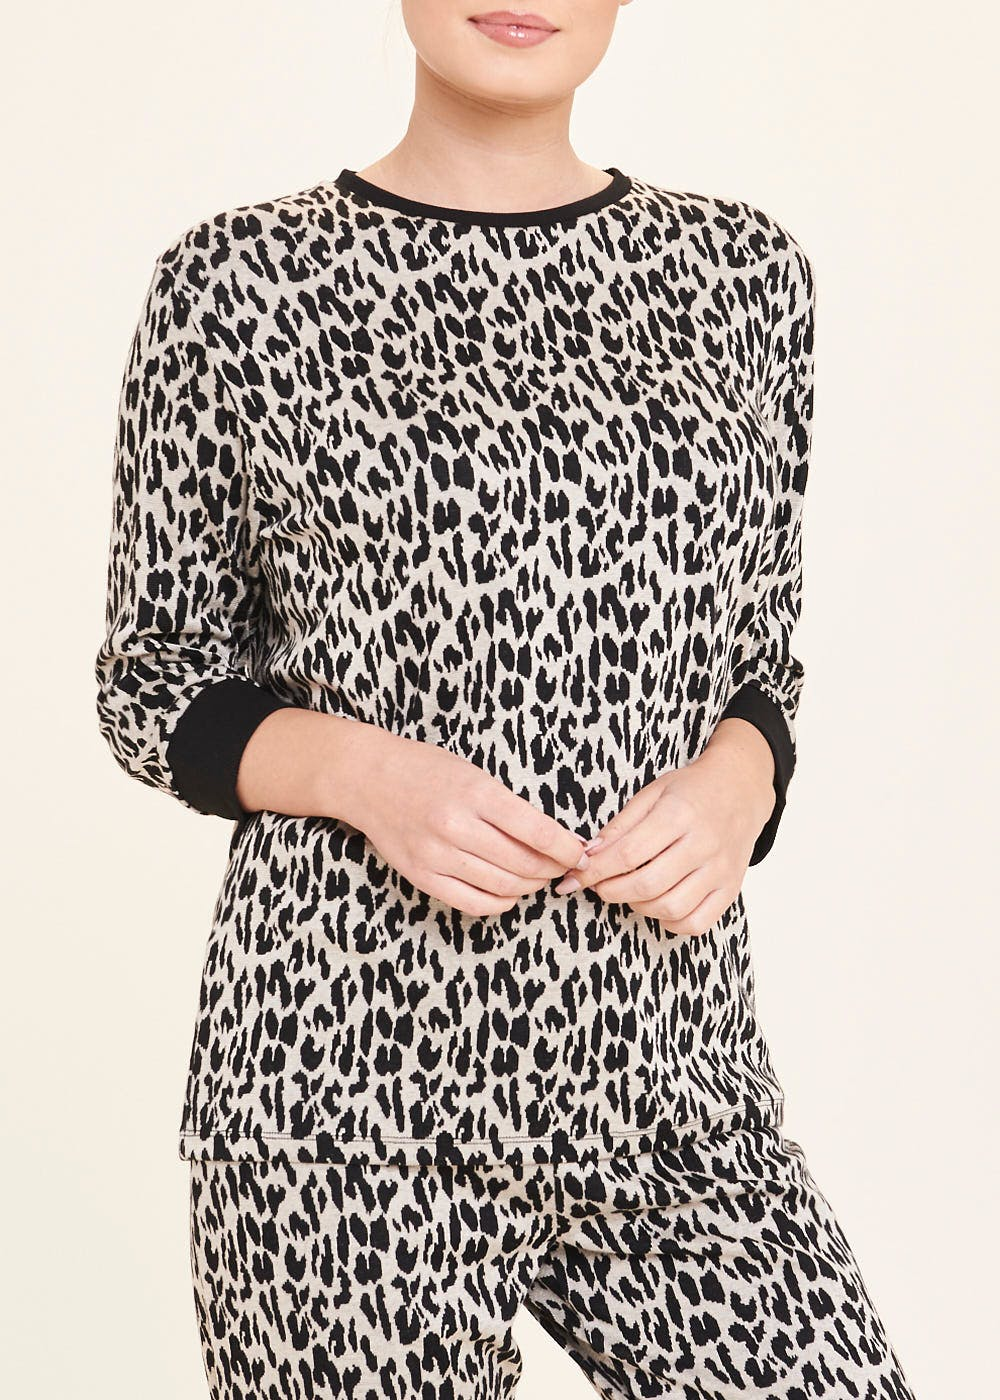 Jacquard Animal Print Sweatshirt